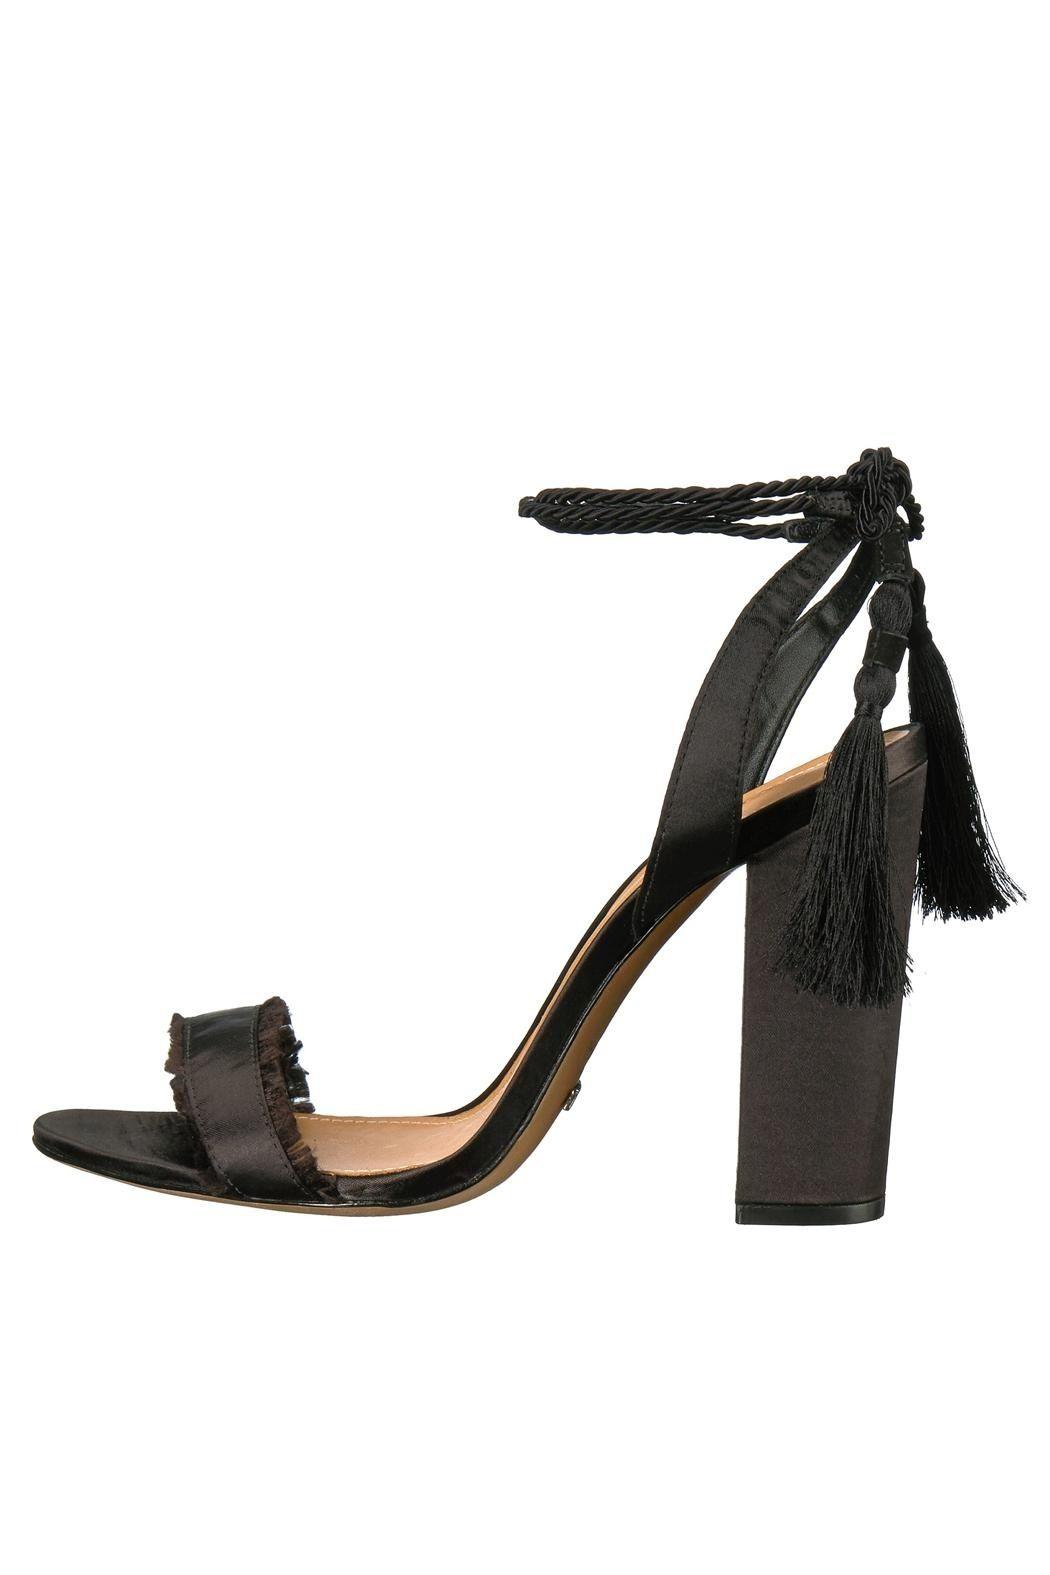 d77d053f125d Schutz black tassel heel shoptiques love box pinterest tassel jpg 1050x1575 Schutz  black pumps